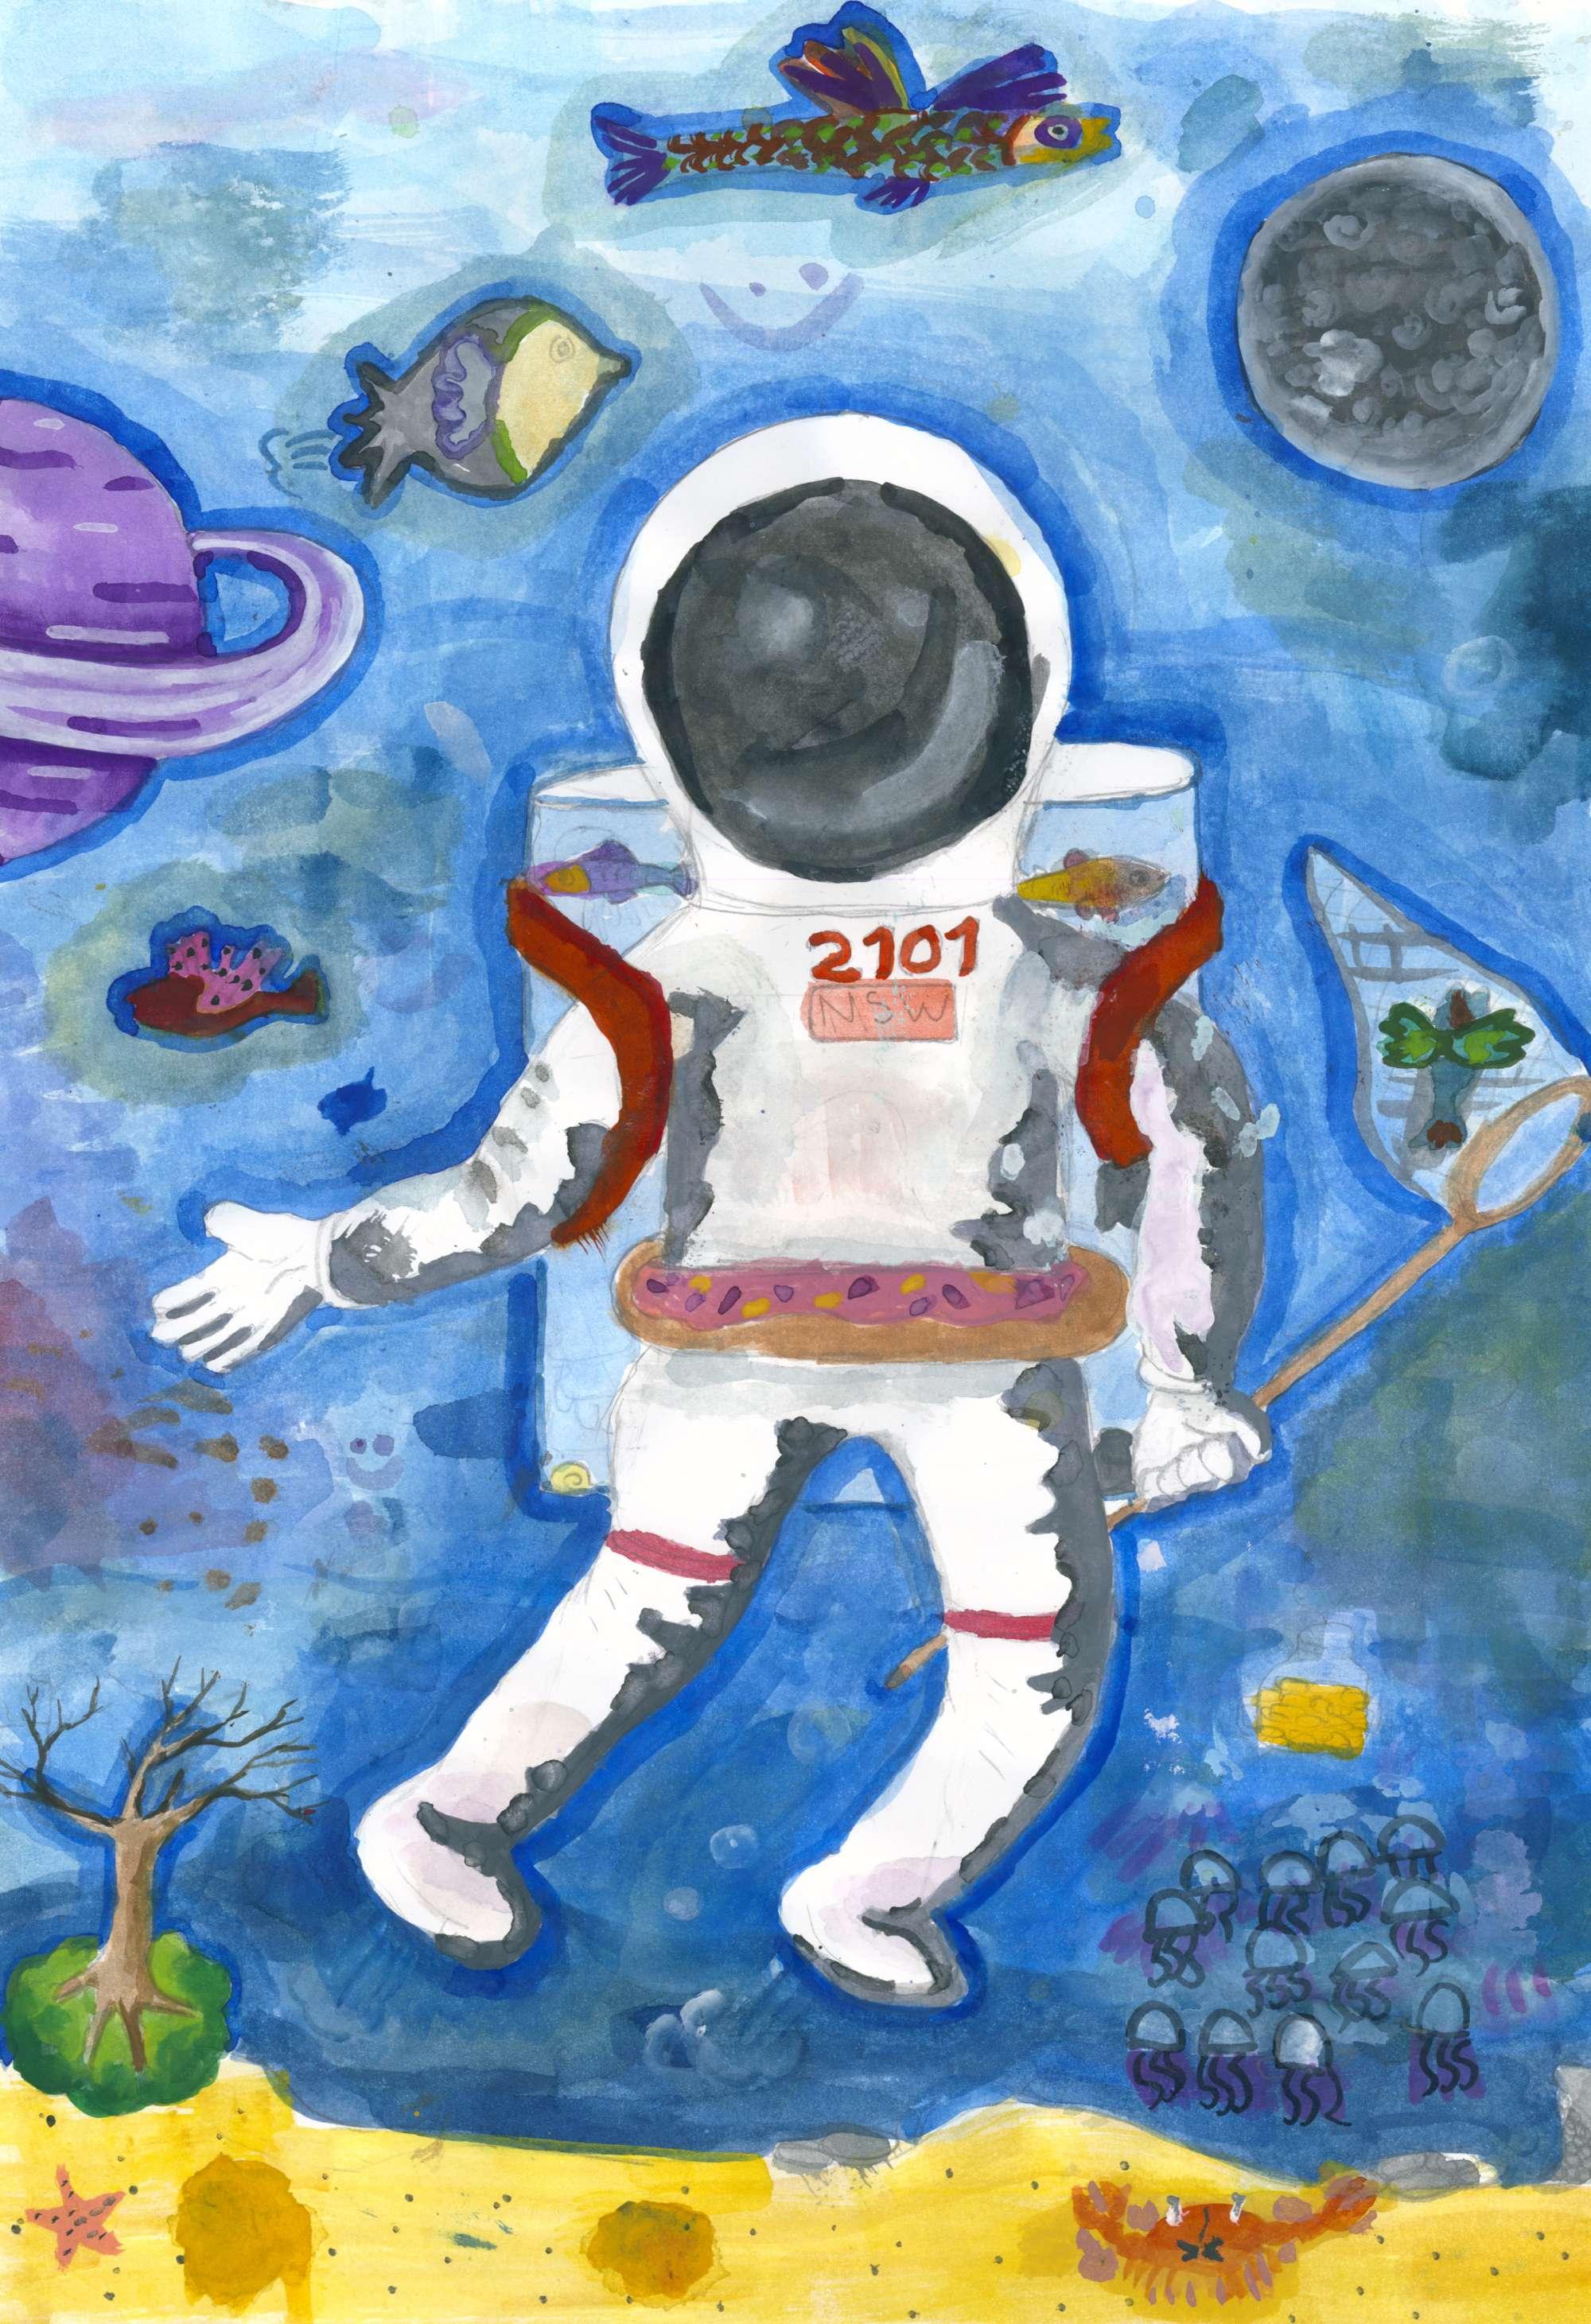 Astronaut Under the Sea